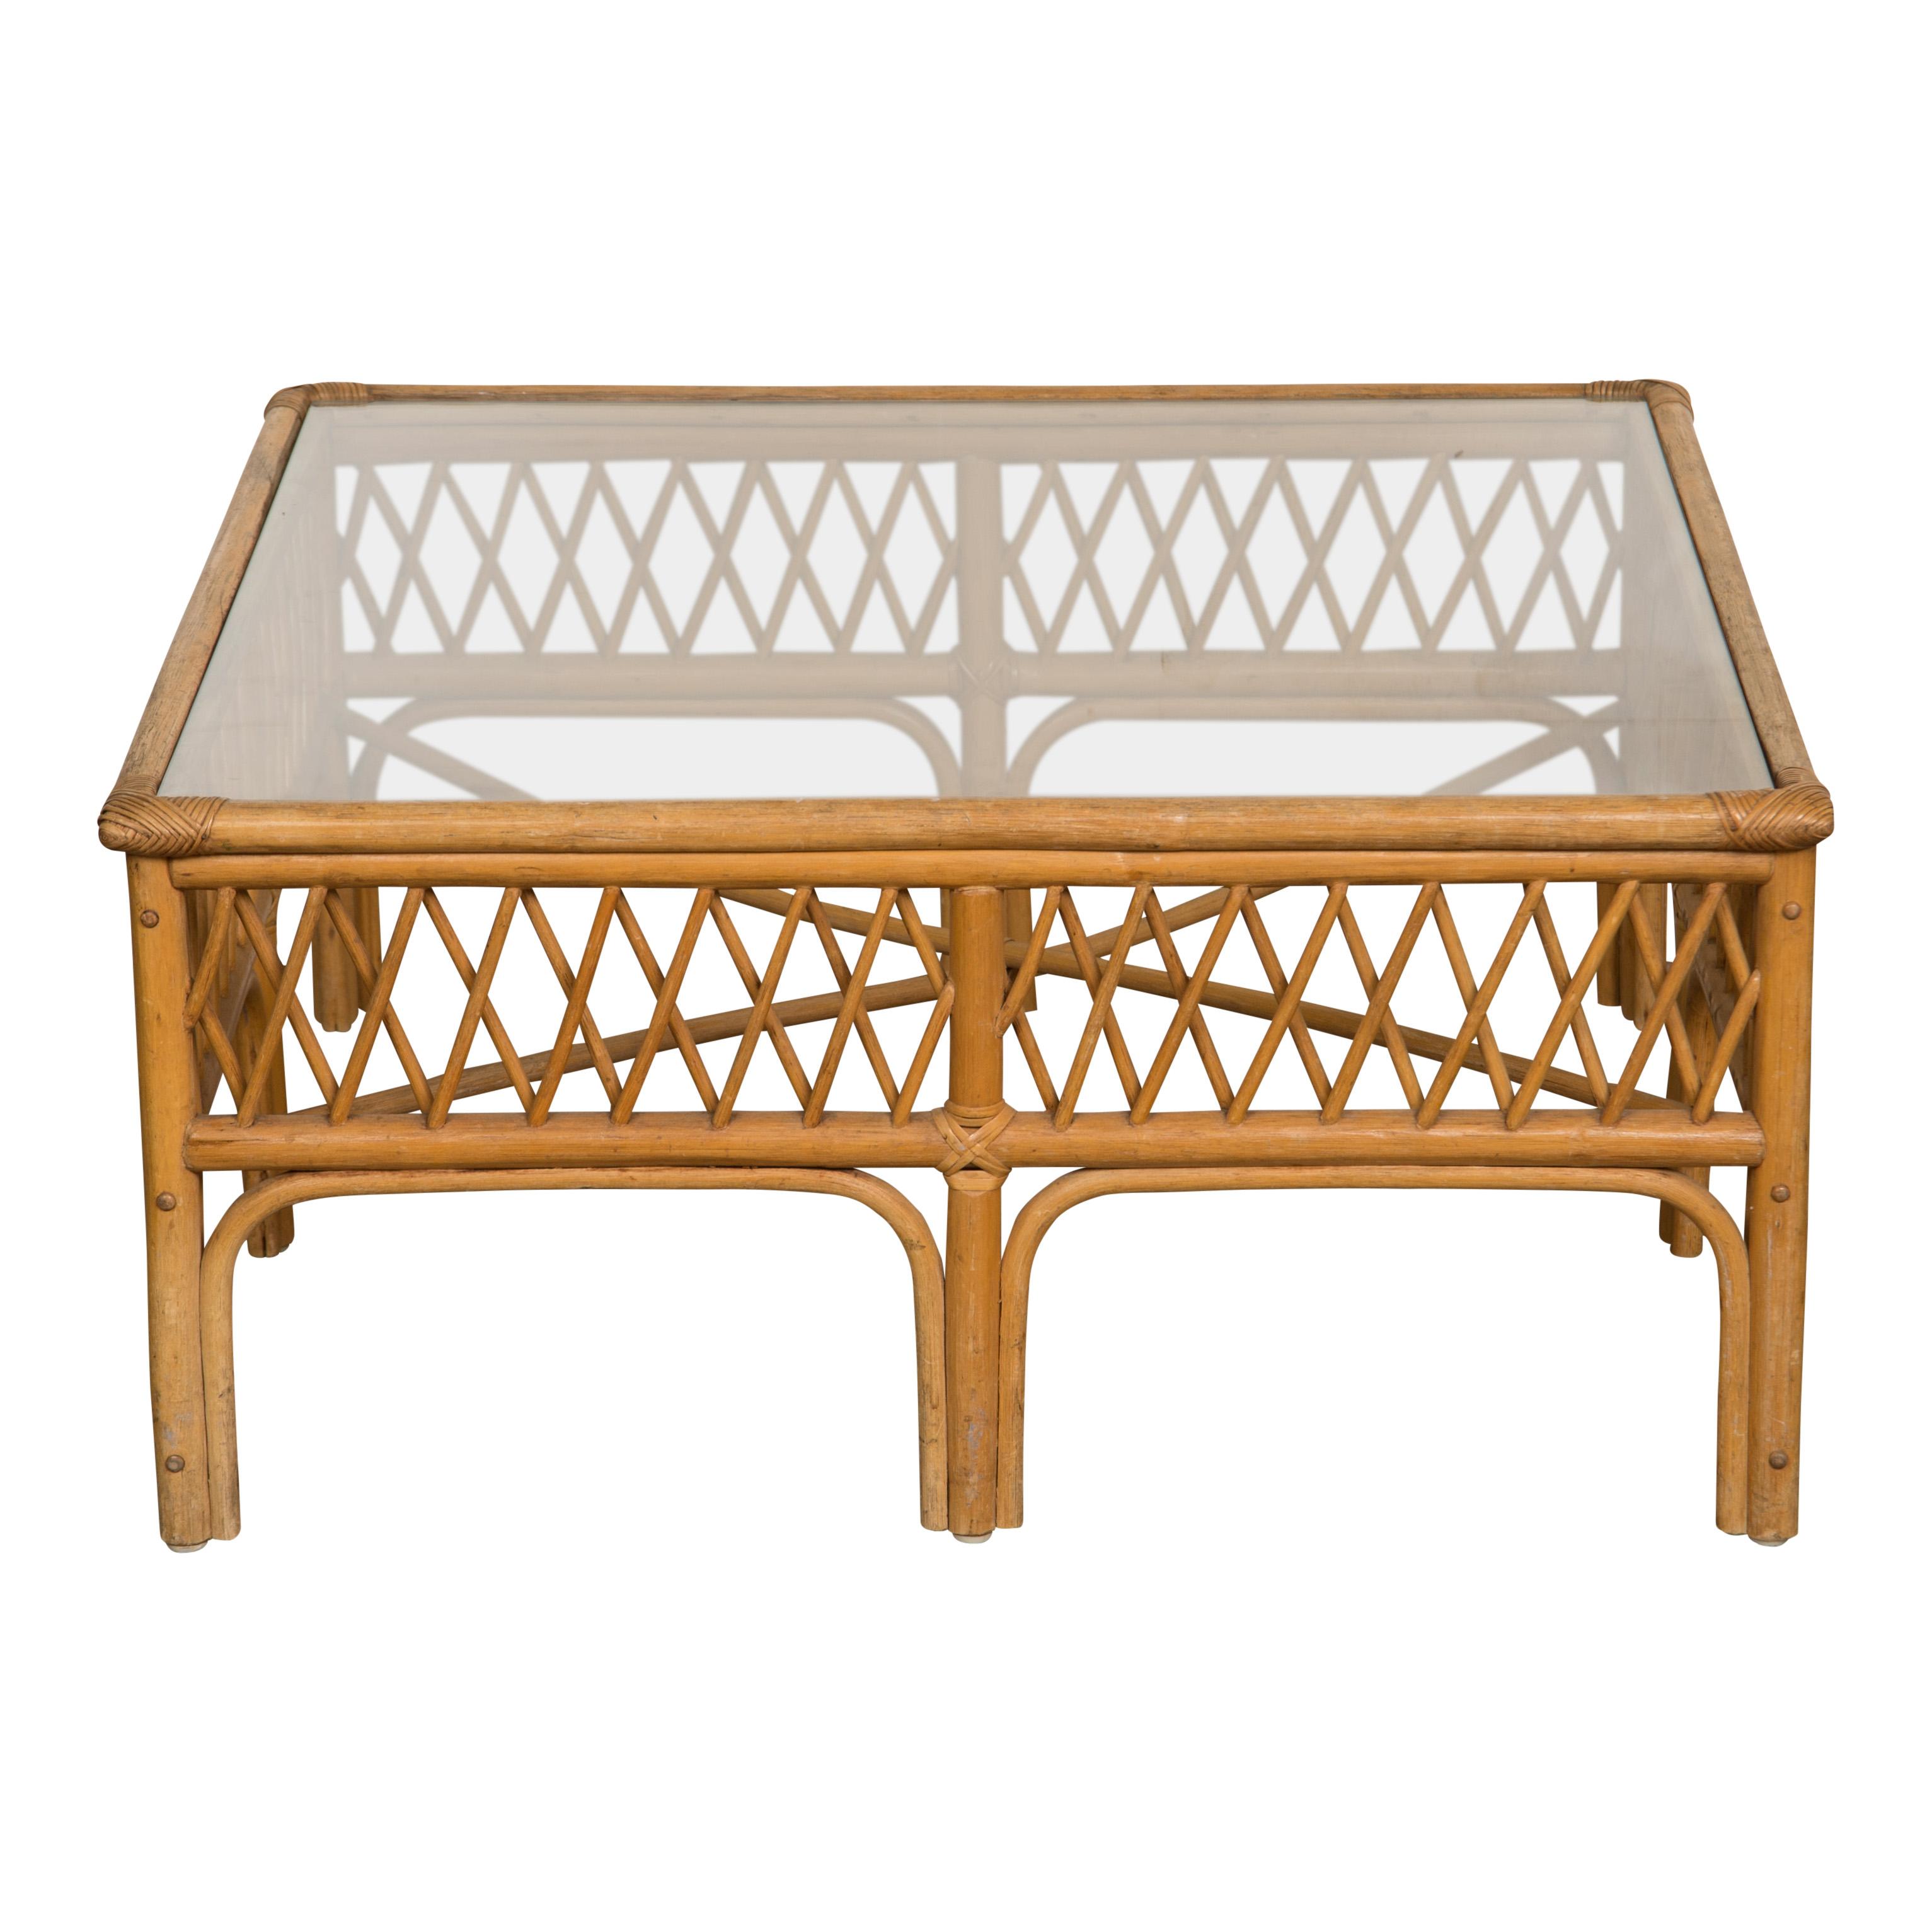 Barolina Coffee Table